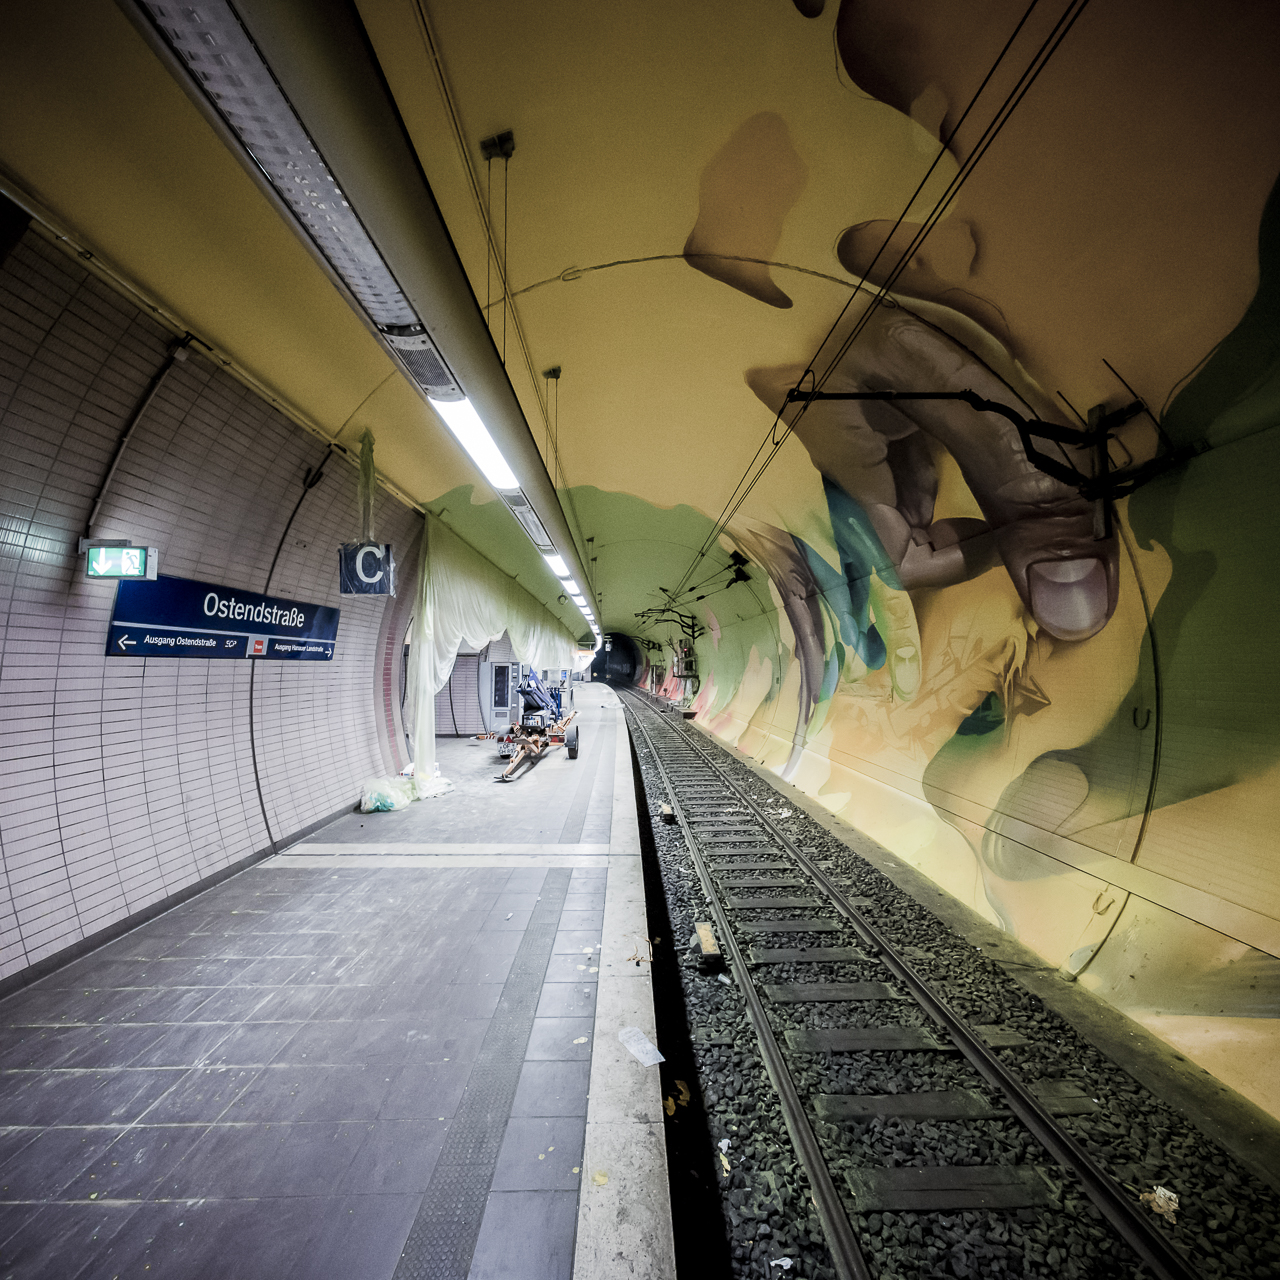 A work by Does - Ostendstrasse frankfurt germany tunnel rudi 3